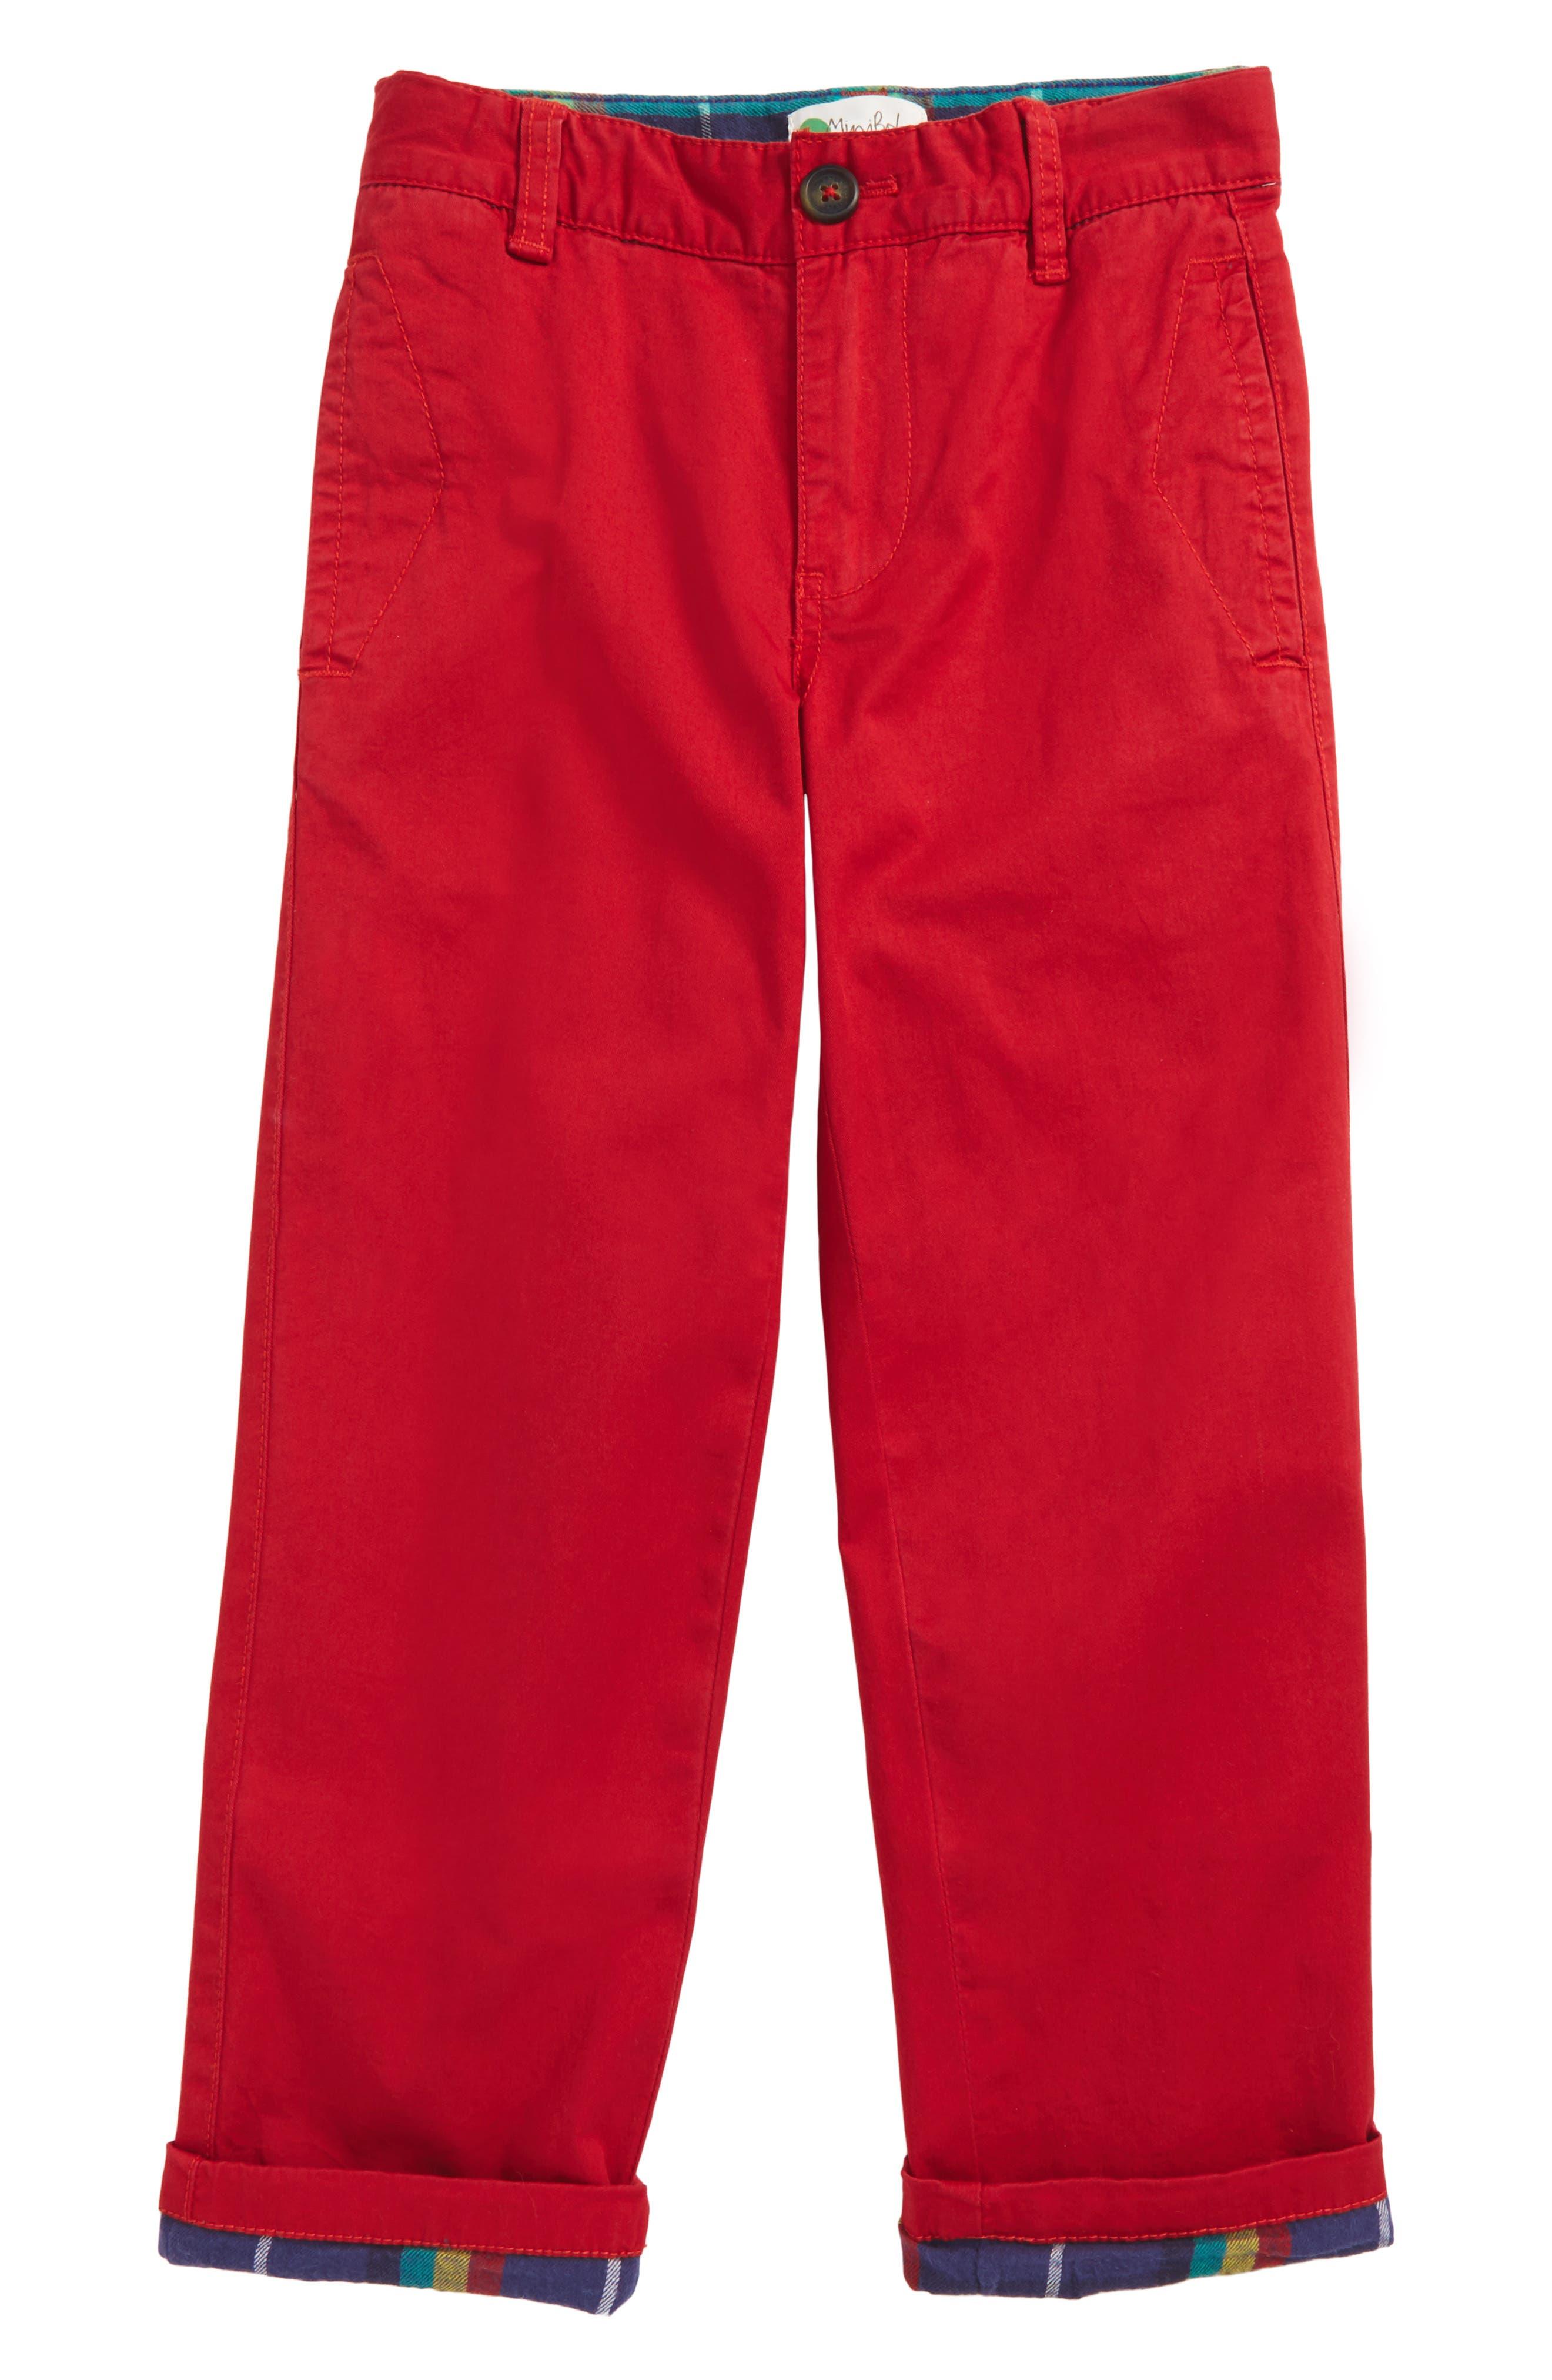 Mini Boden Lined Chino Pants (Toddler Boys, Little Boys & Big Boys)